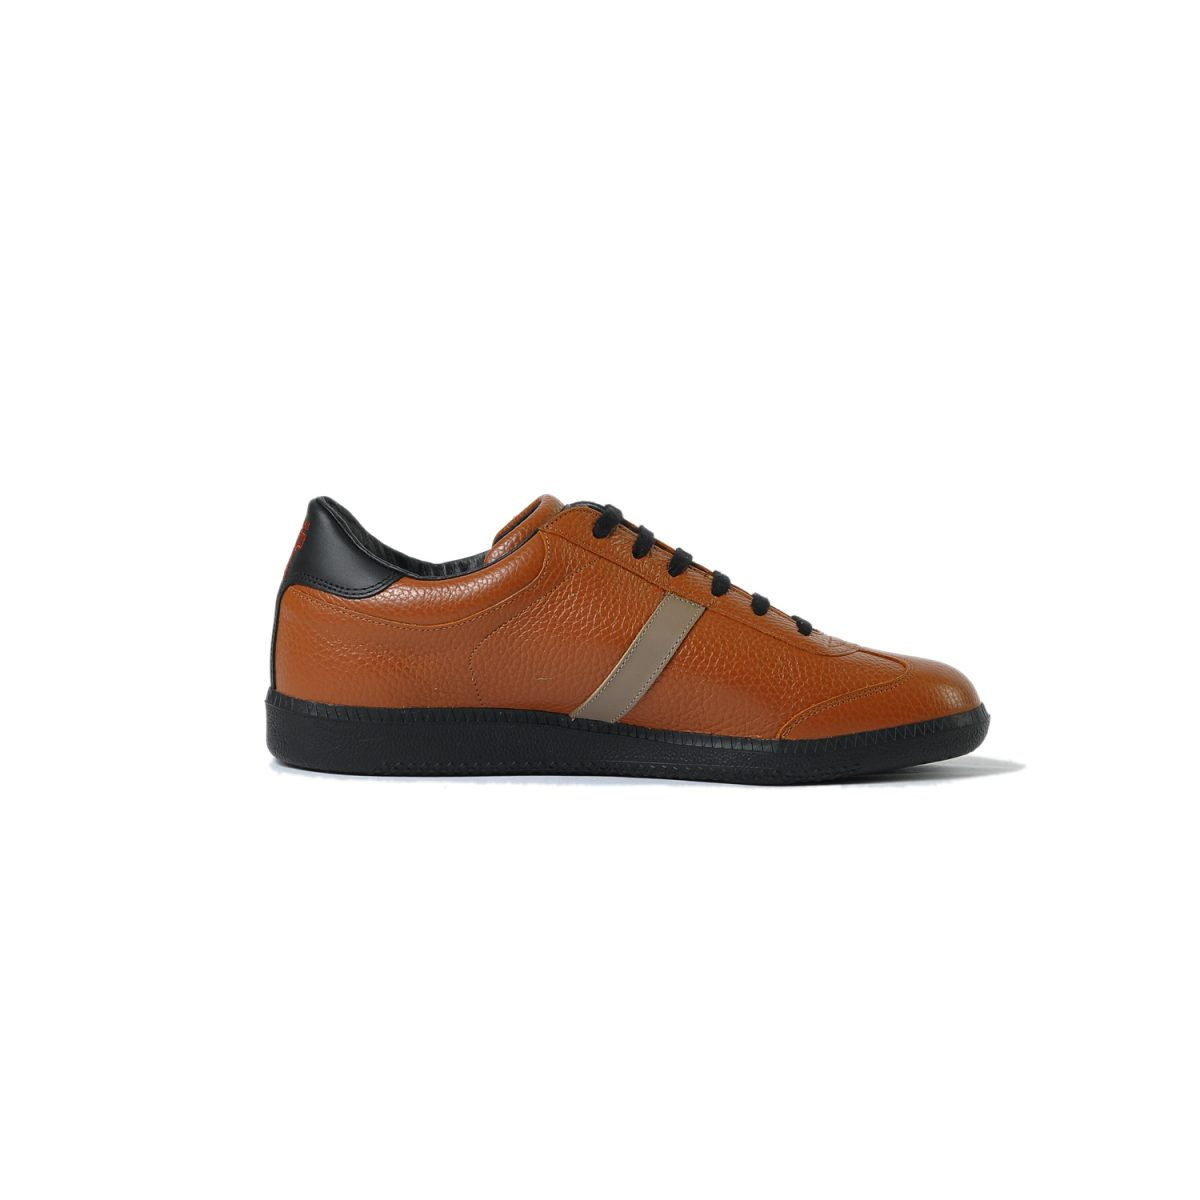 Tisza shoes - Compakt - Maroon